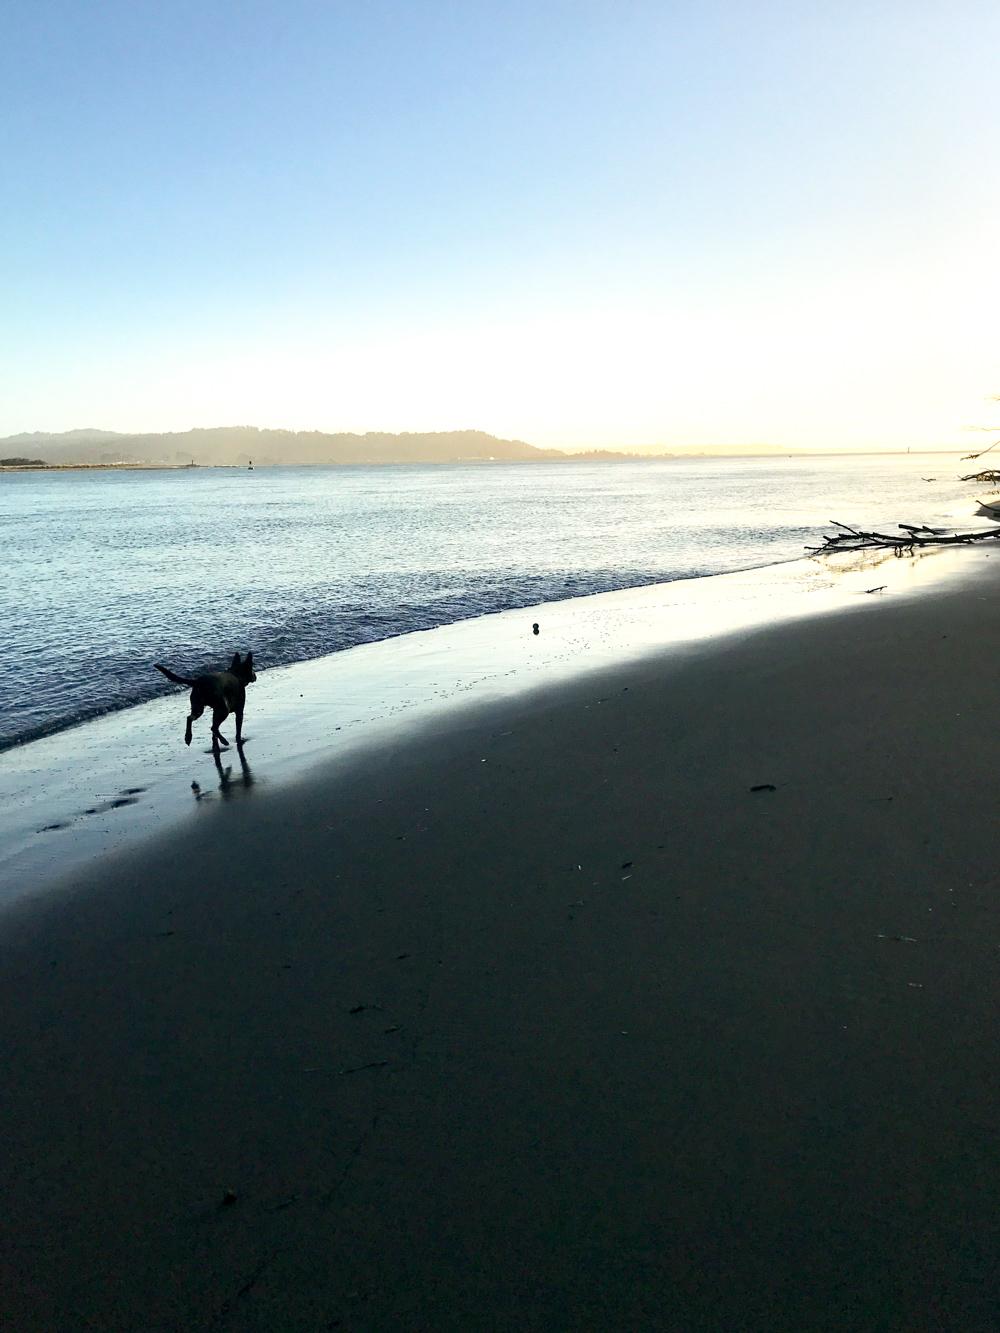 Pixel on the beach